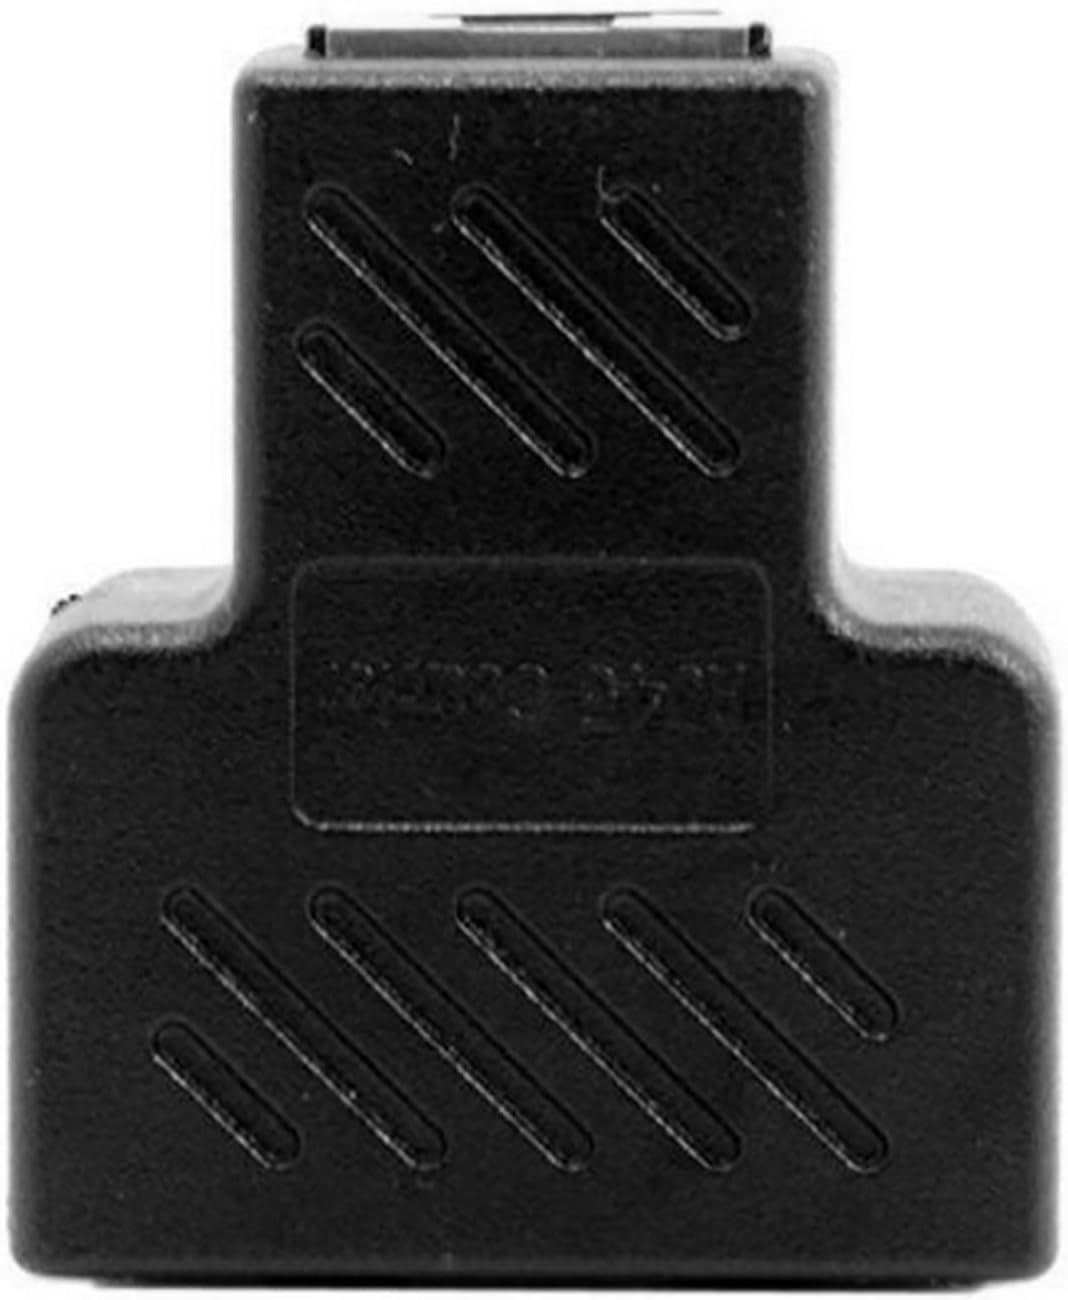 Ruiqas RJ45 Splitter Adapter 1 to 2 Ways Dual Female Port CAT6 LAN Ethernet Cable Black